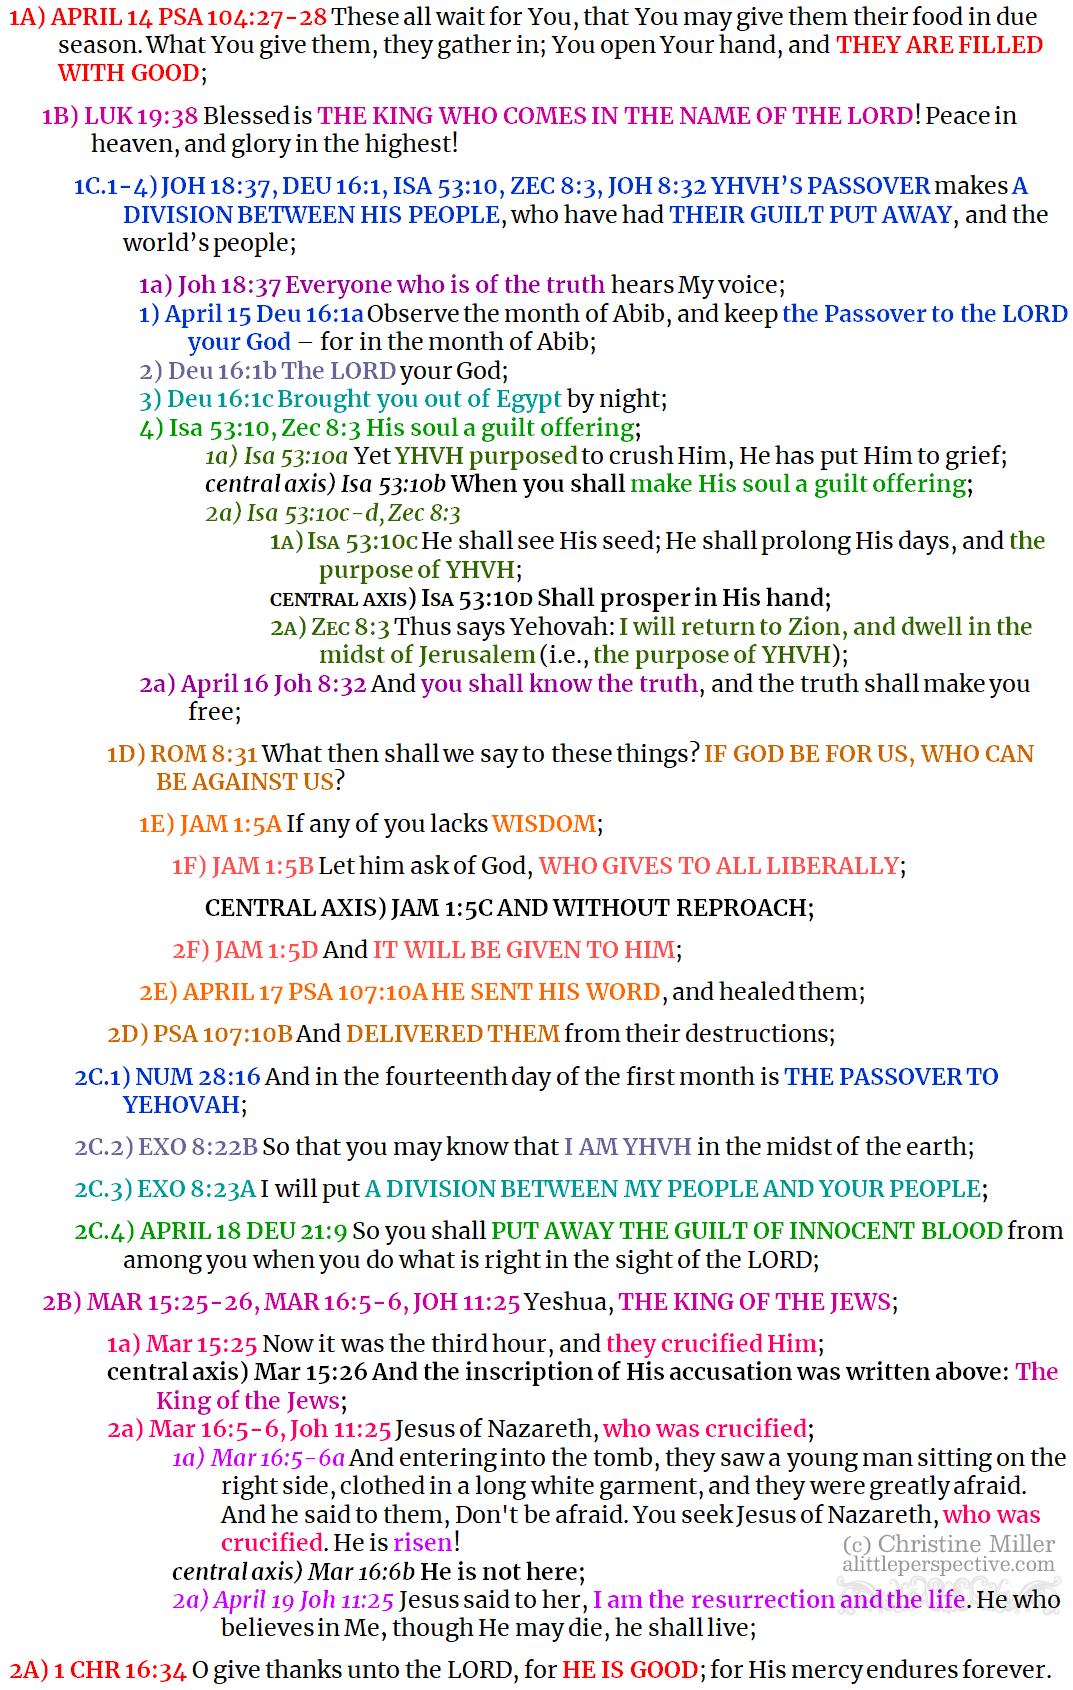 Apr 14-19 shabbat prophetic chiasm | alittleperspective.com